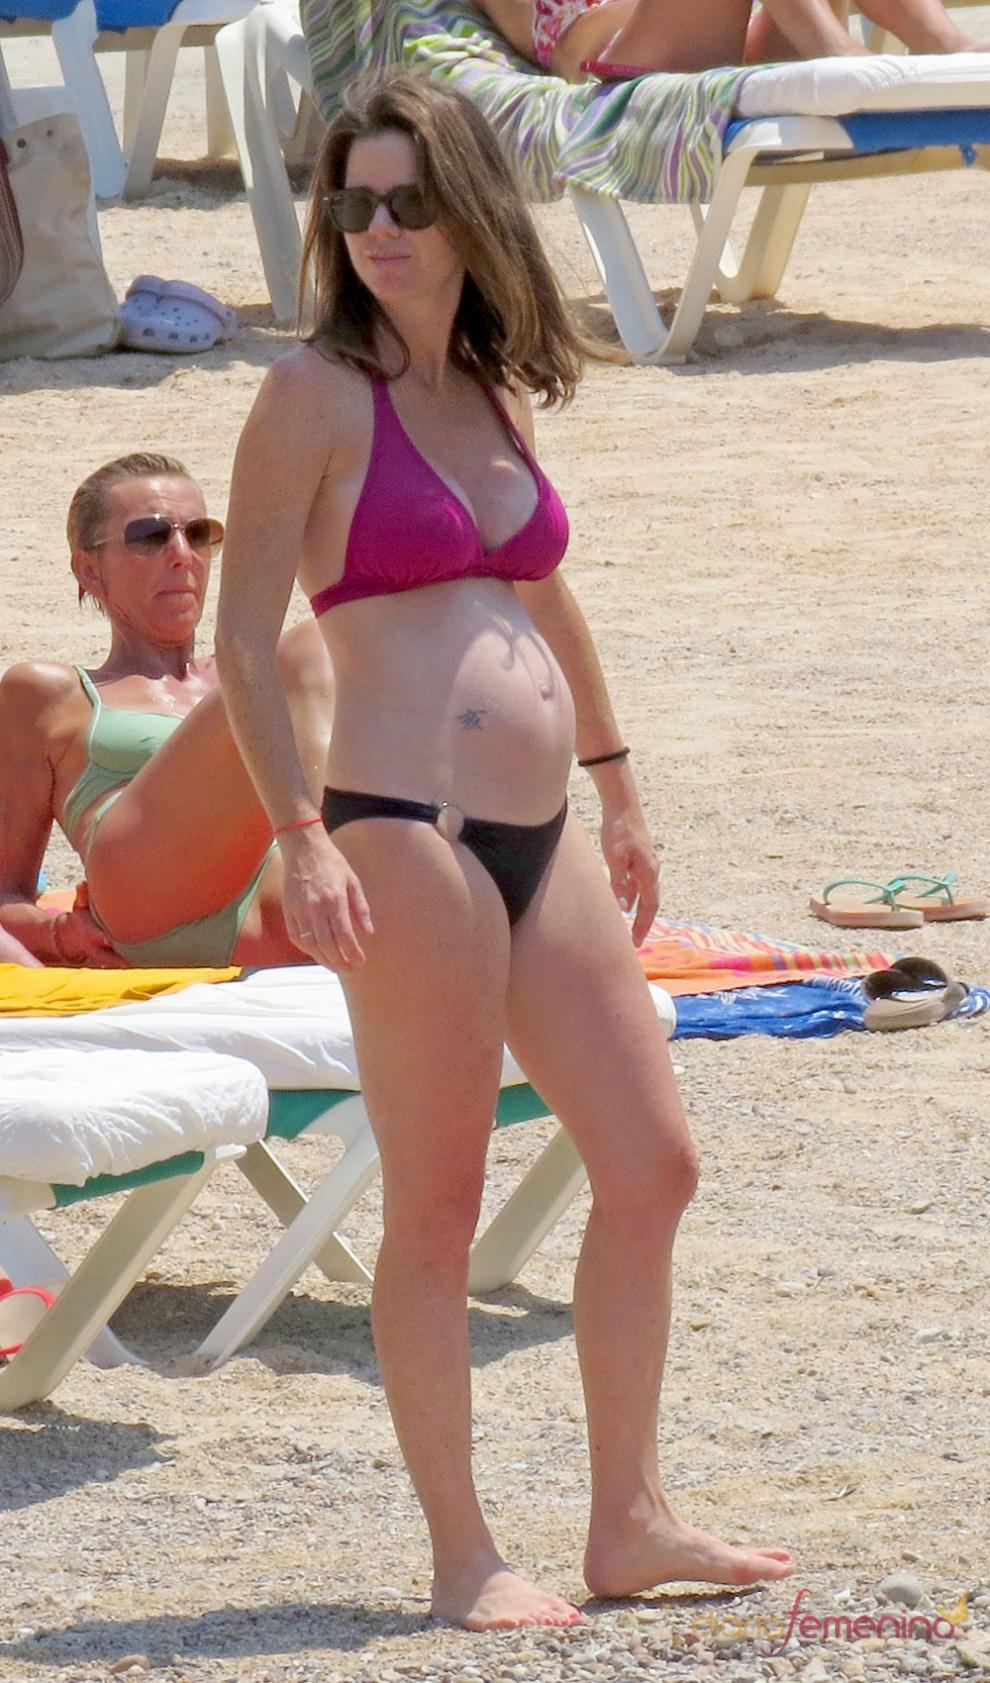 Famosas embarazadas en biquini Amelia Bono